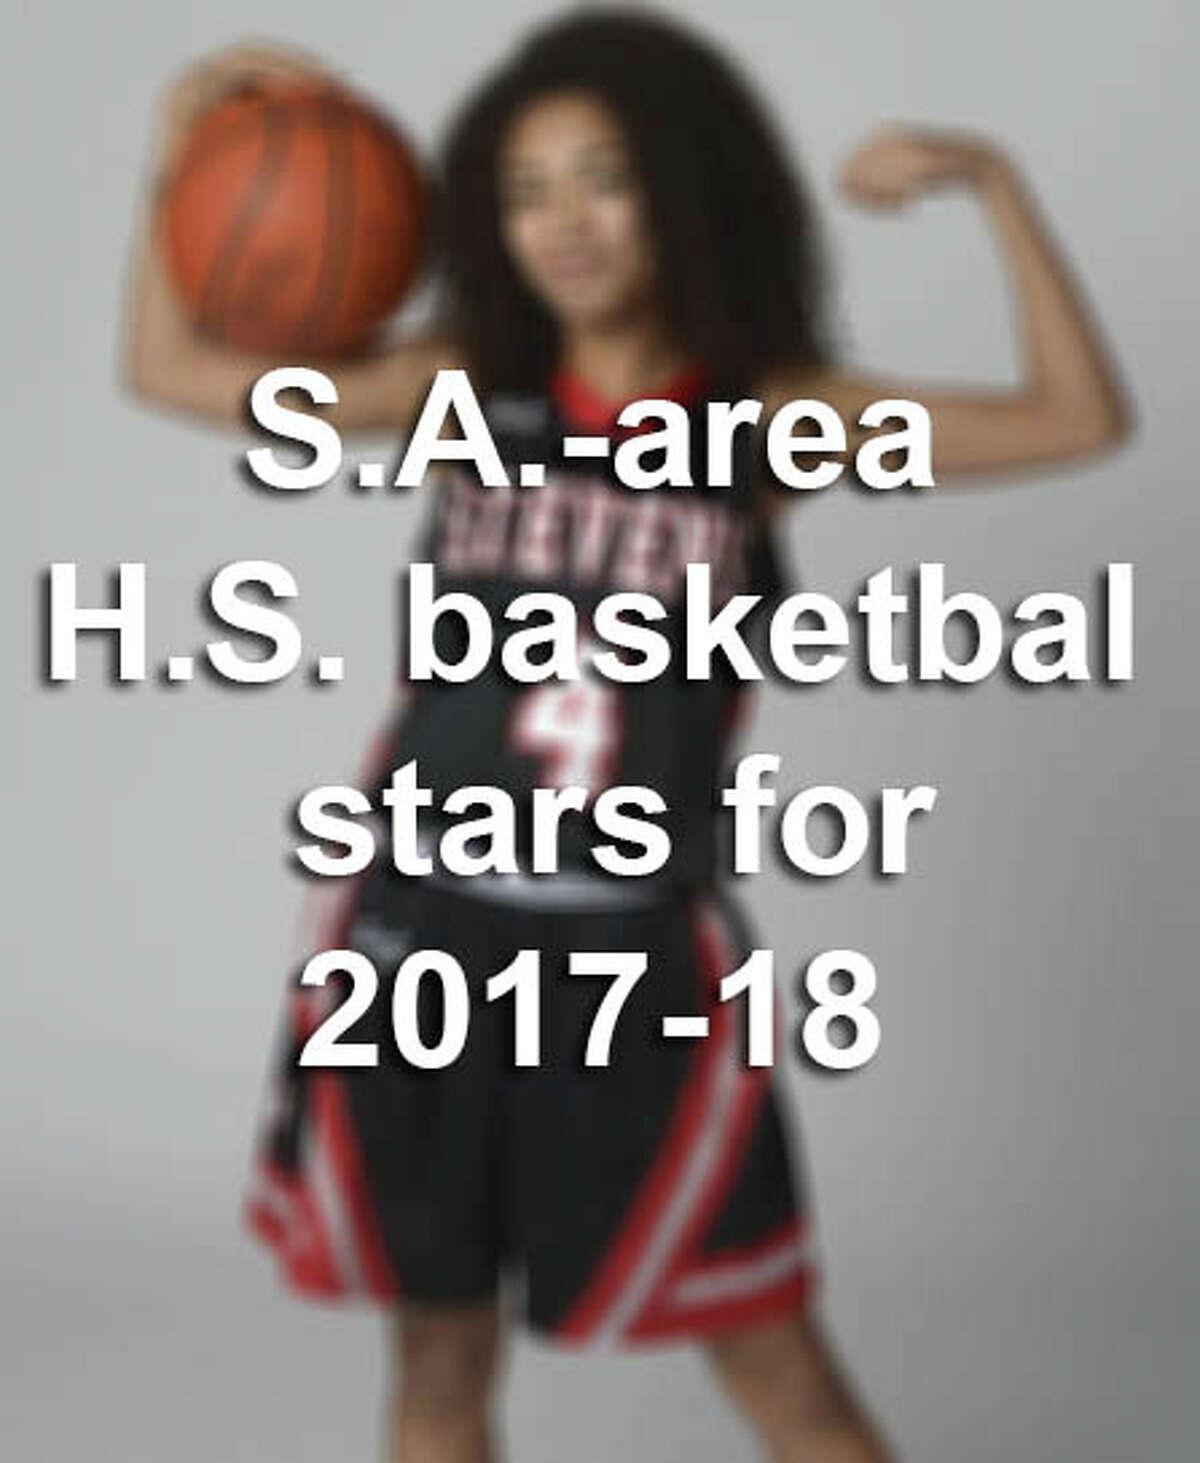 26 San Antonio-area high school basketball stars to watch for in the 2017-18 season